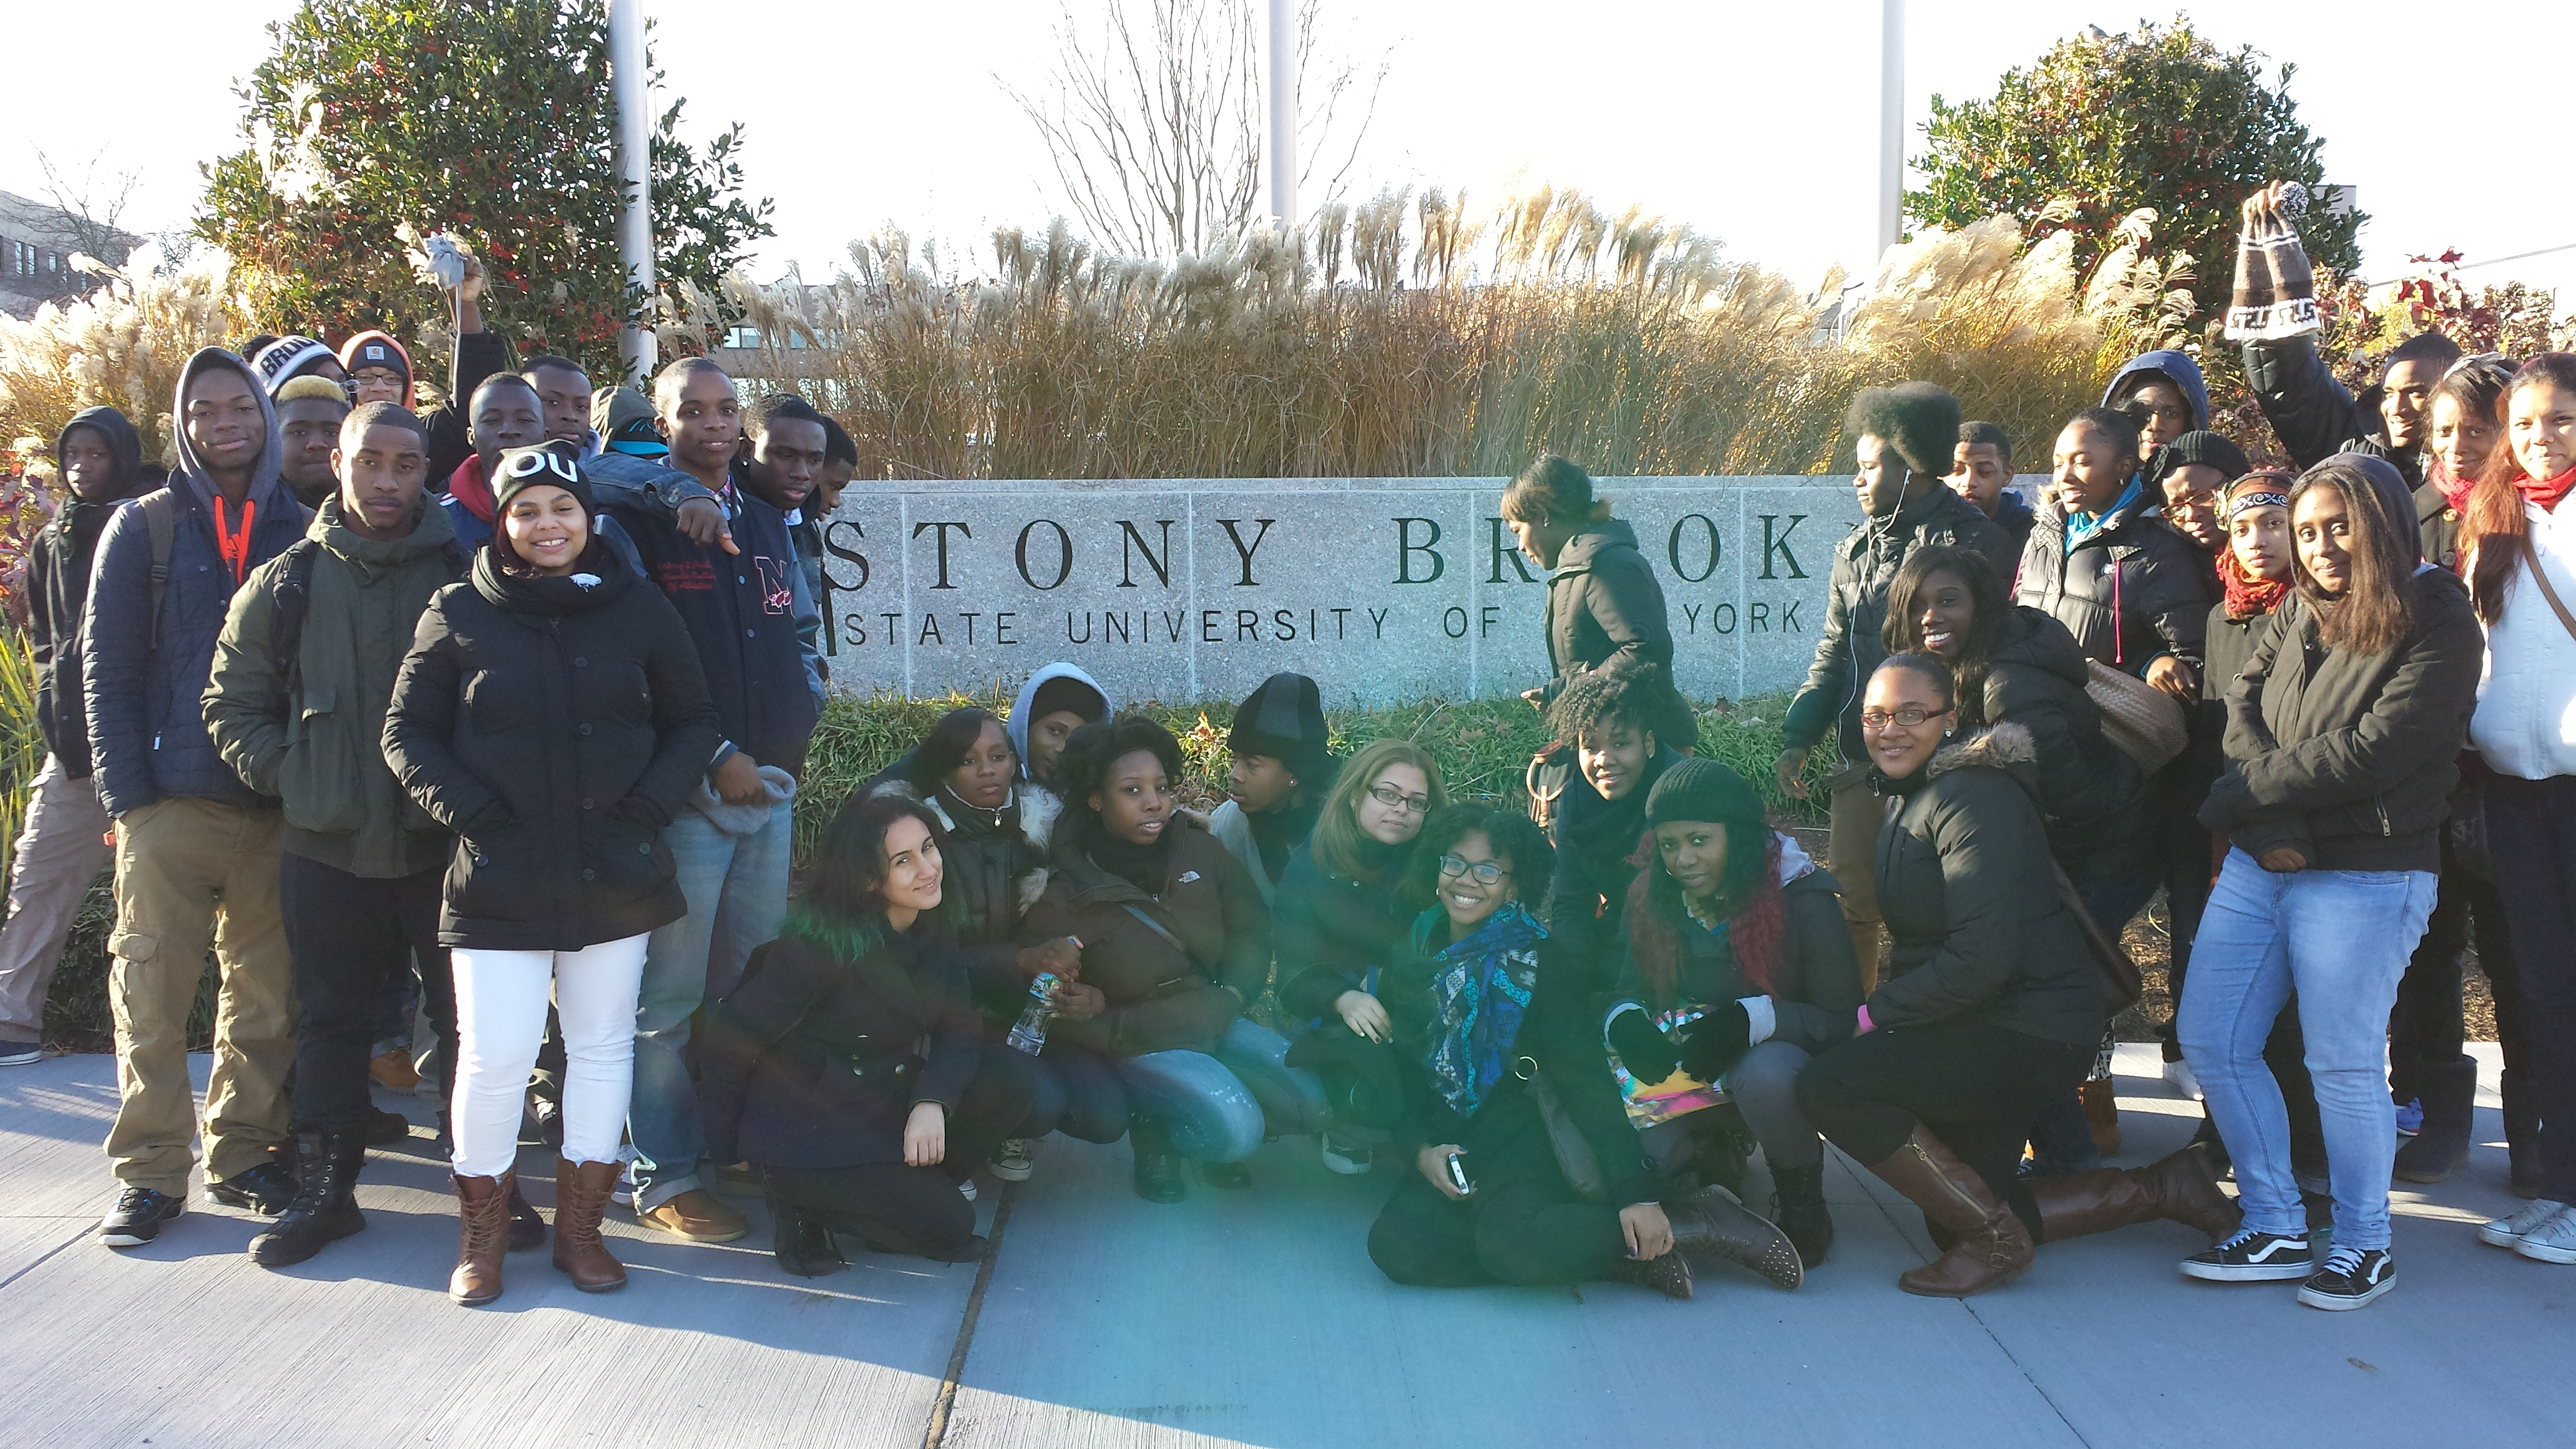 Stony Brook University, 2013